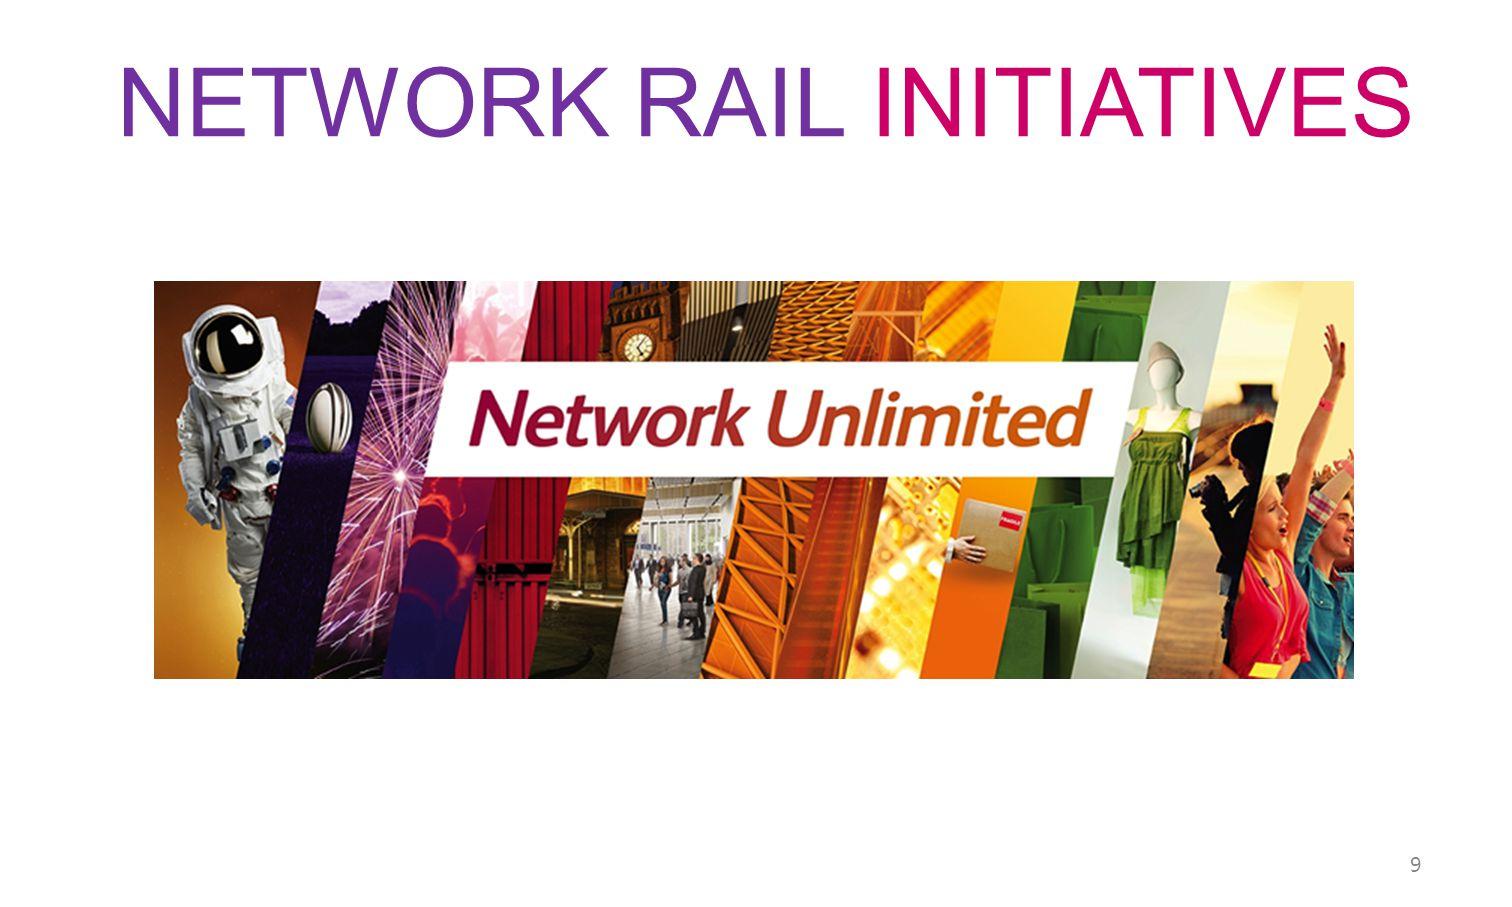 NETWORK RAIL INITIATIVES 9